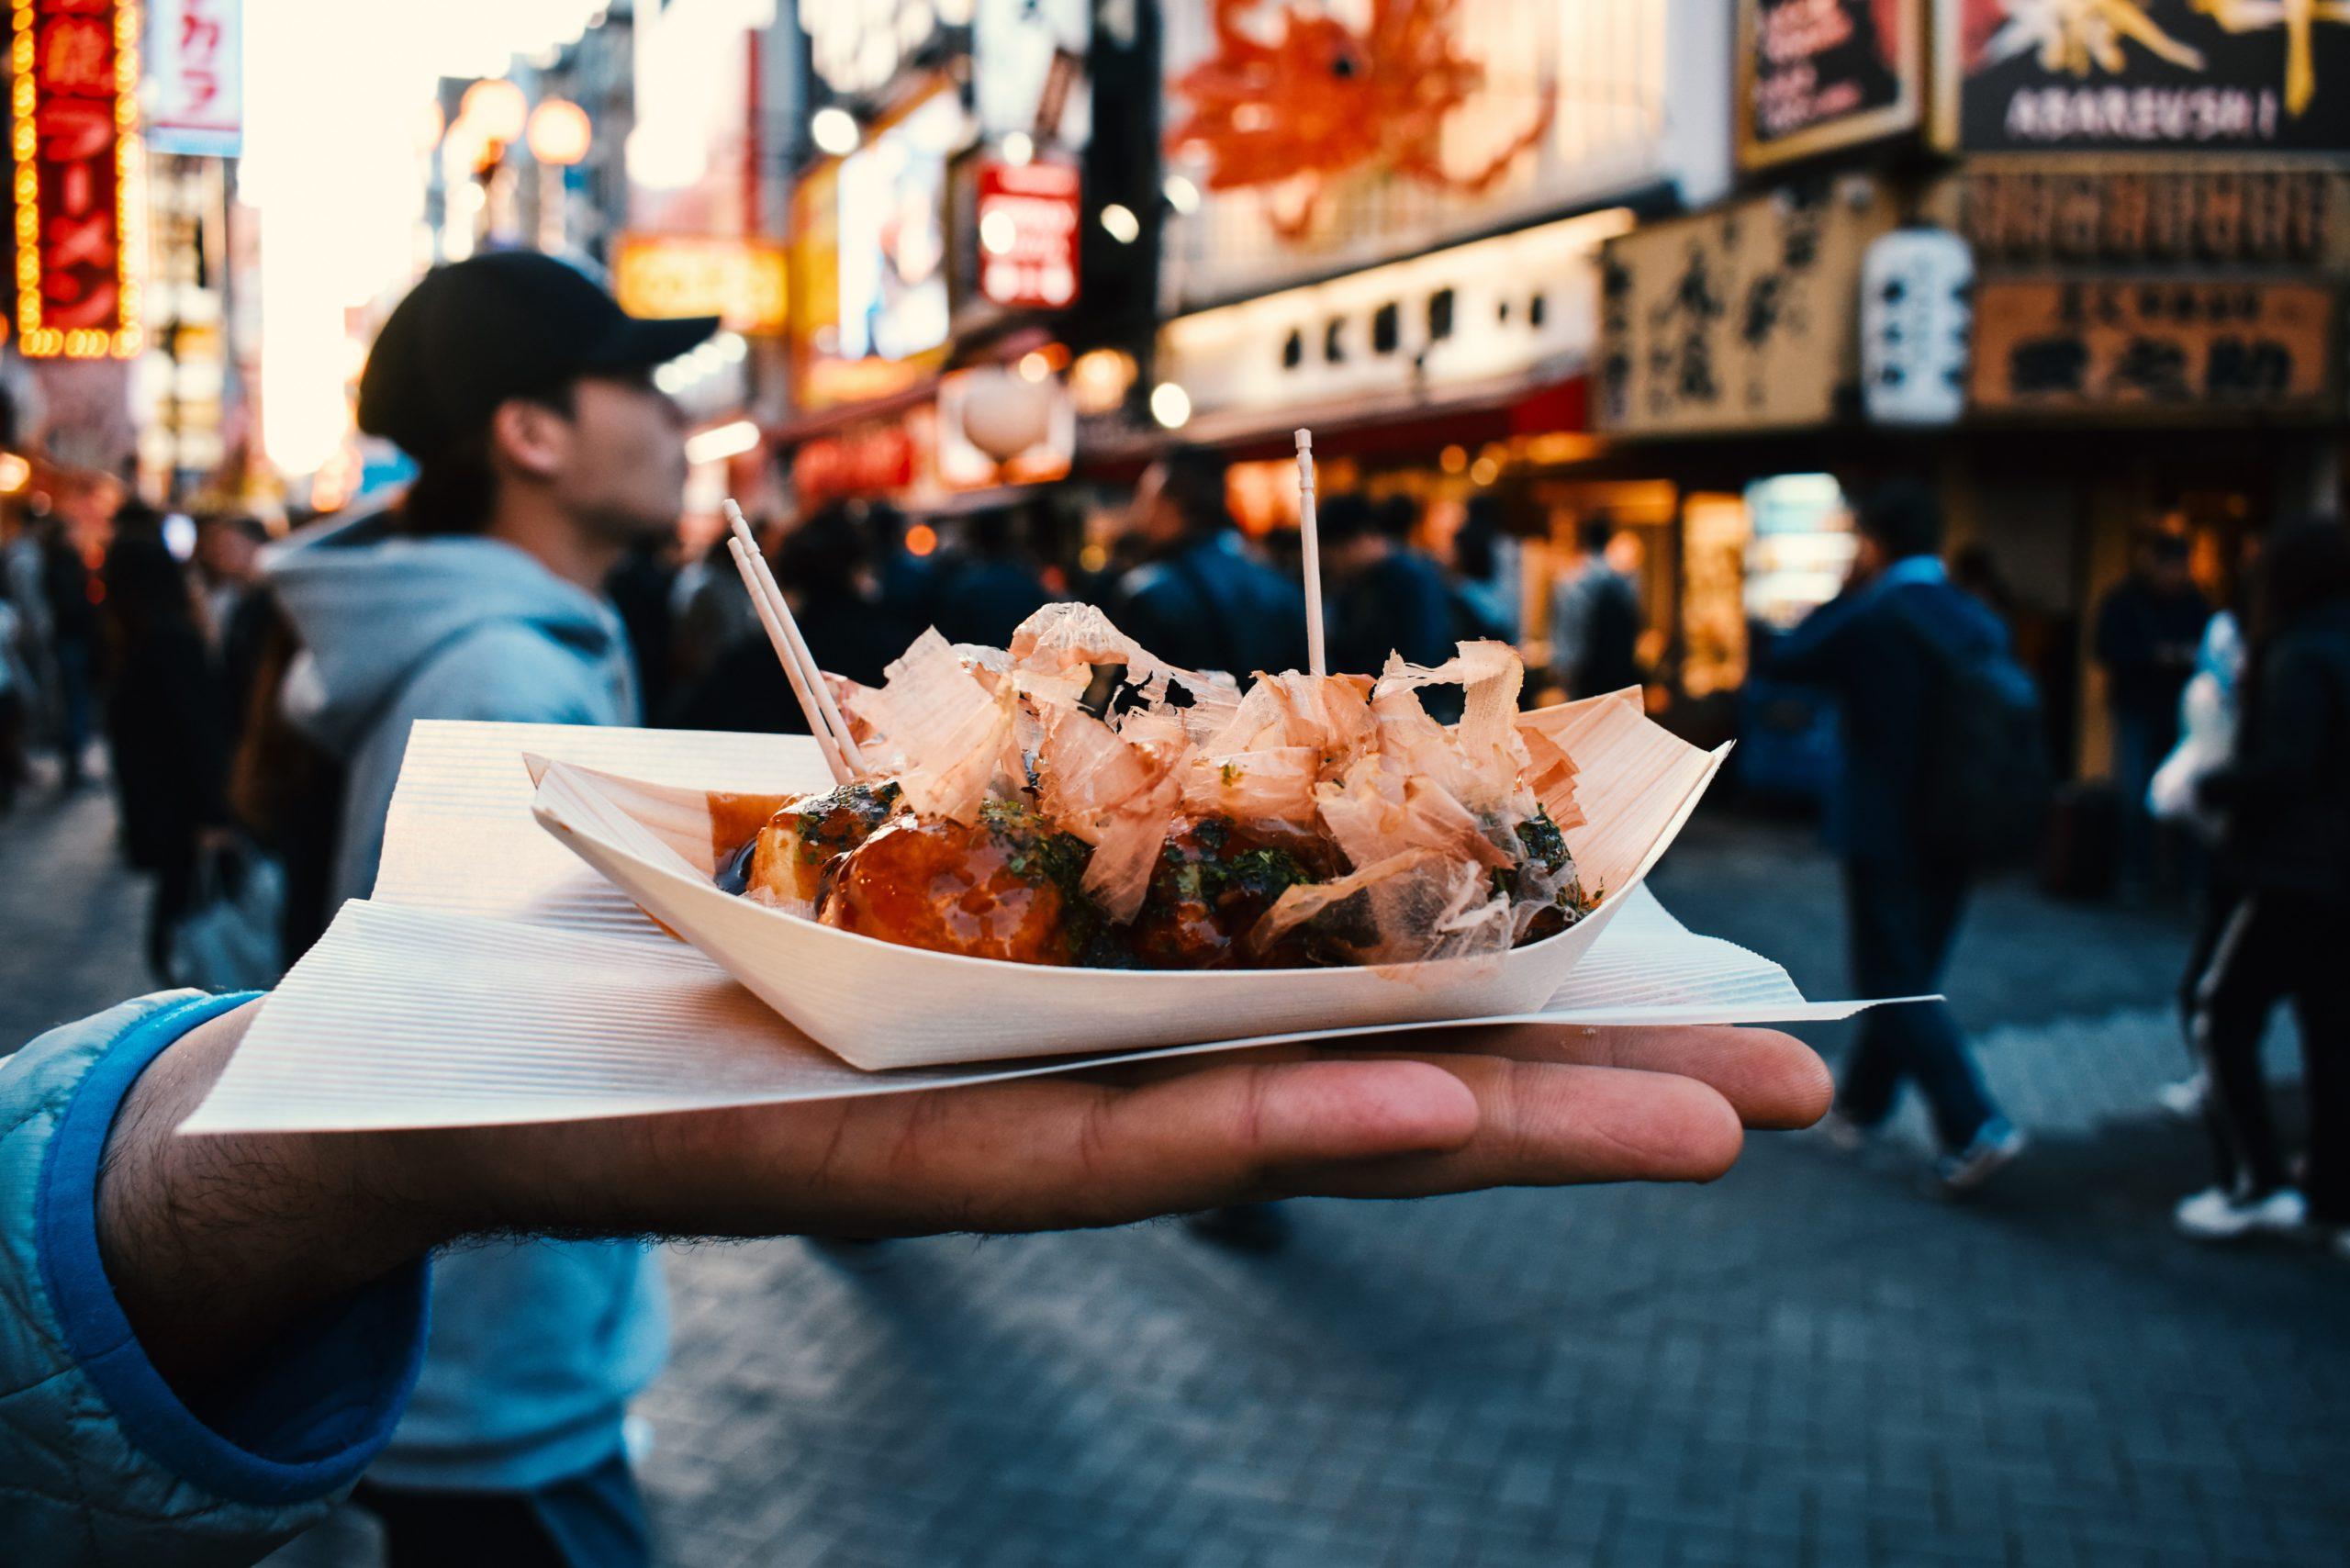 27 febrero 2019 – Street food around the world